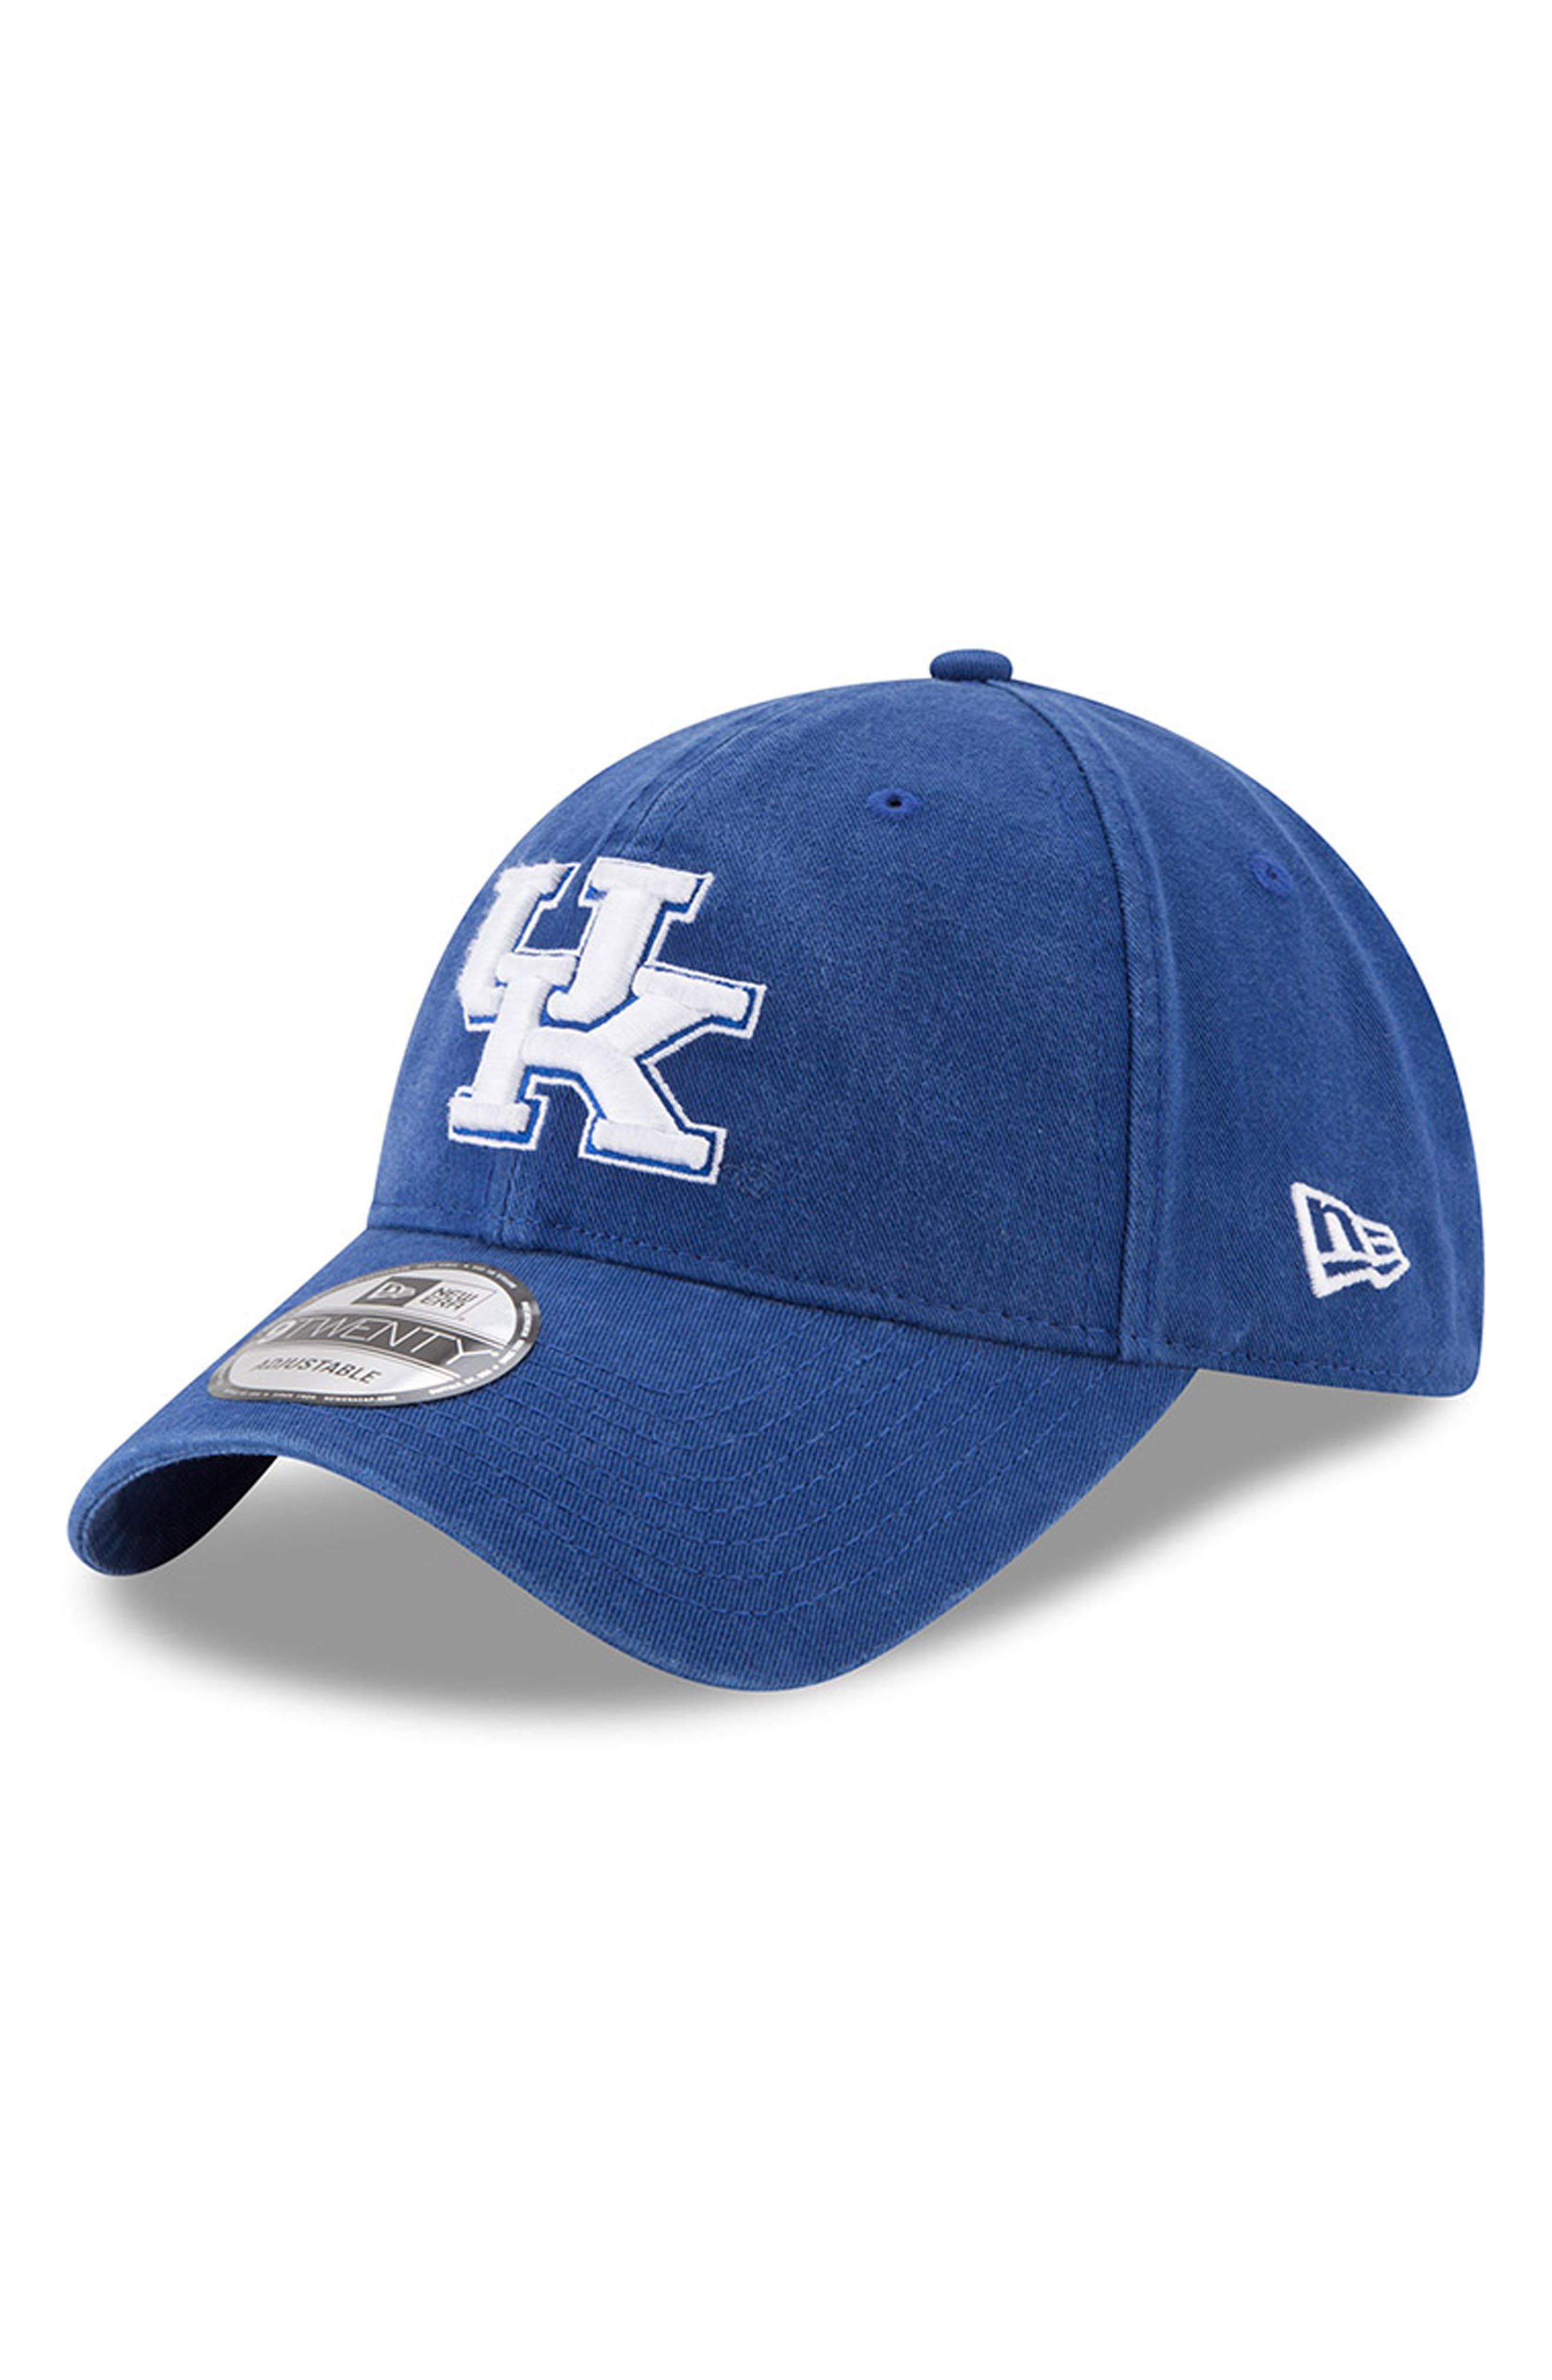 New Era Collegiate Core Classic - Kentucky Wildcats Baseball Cap,                         Main,                         color, Kentucky Wildcats